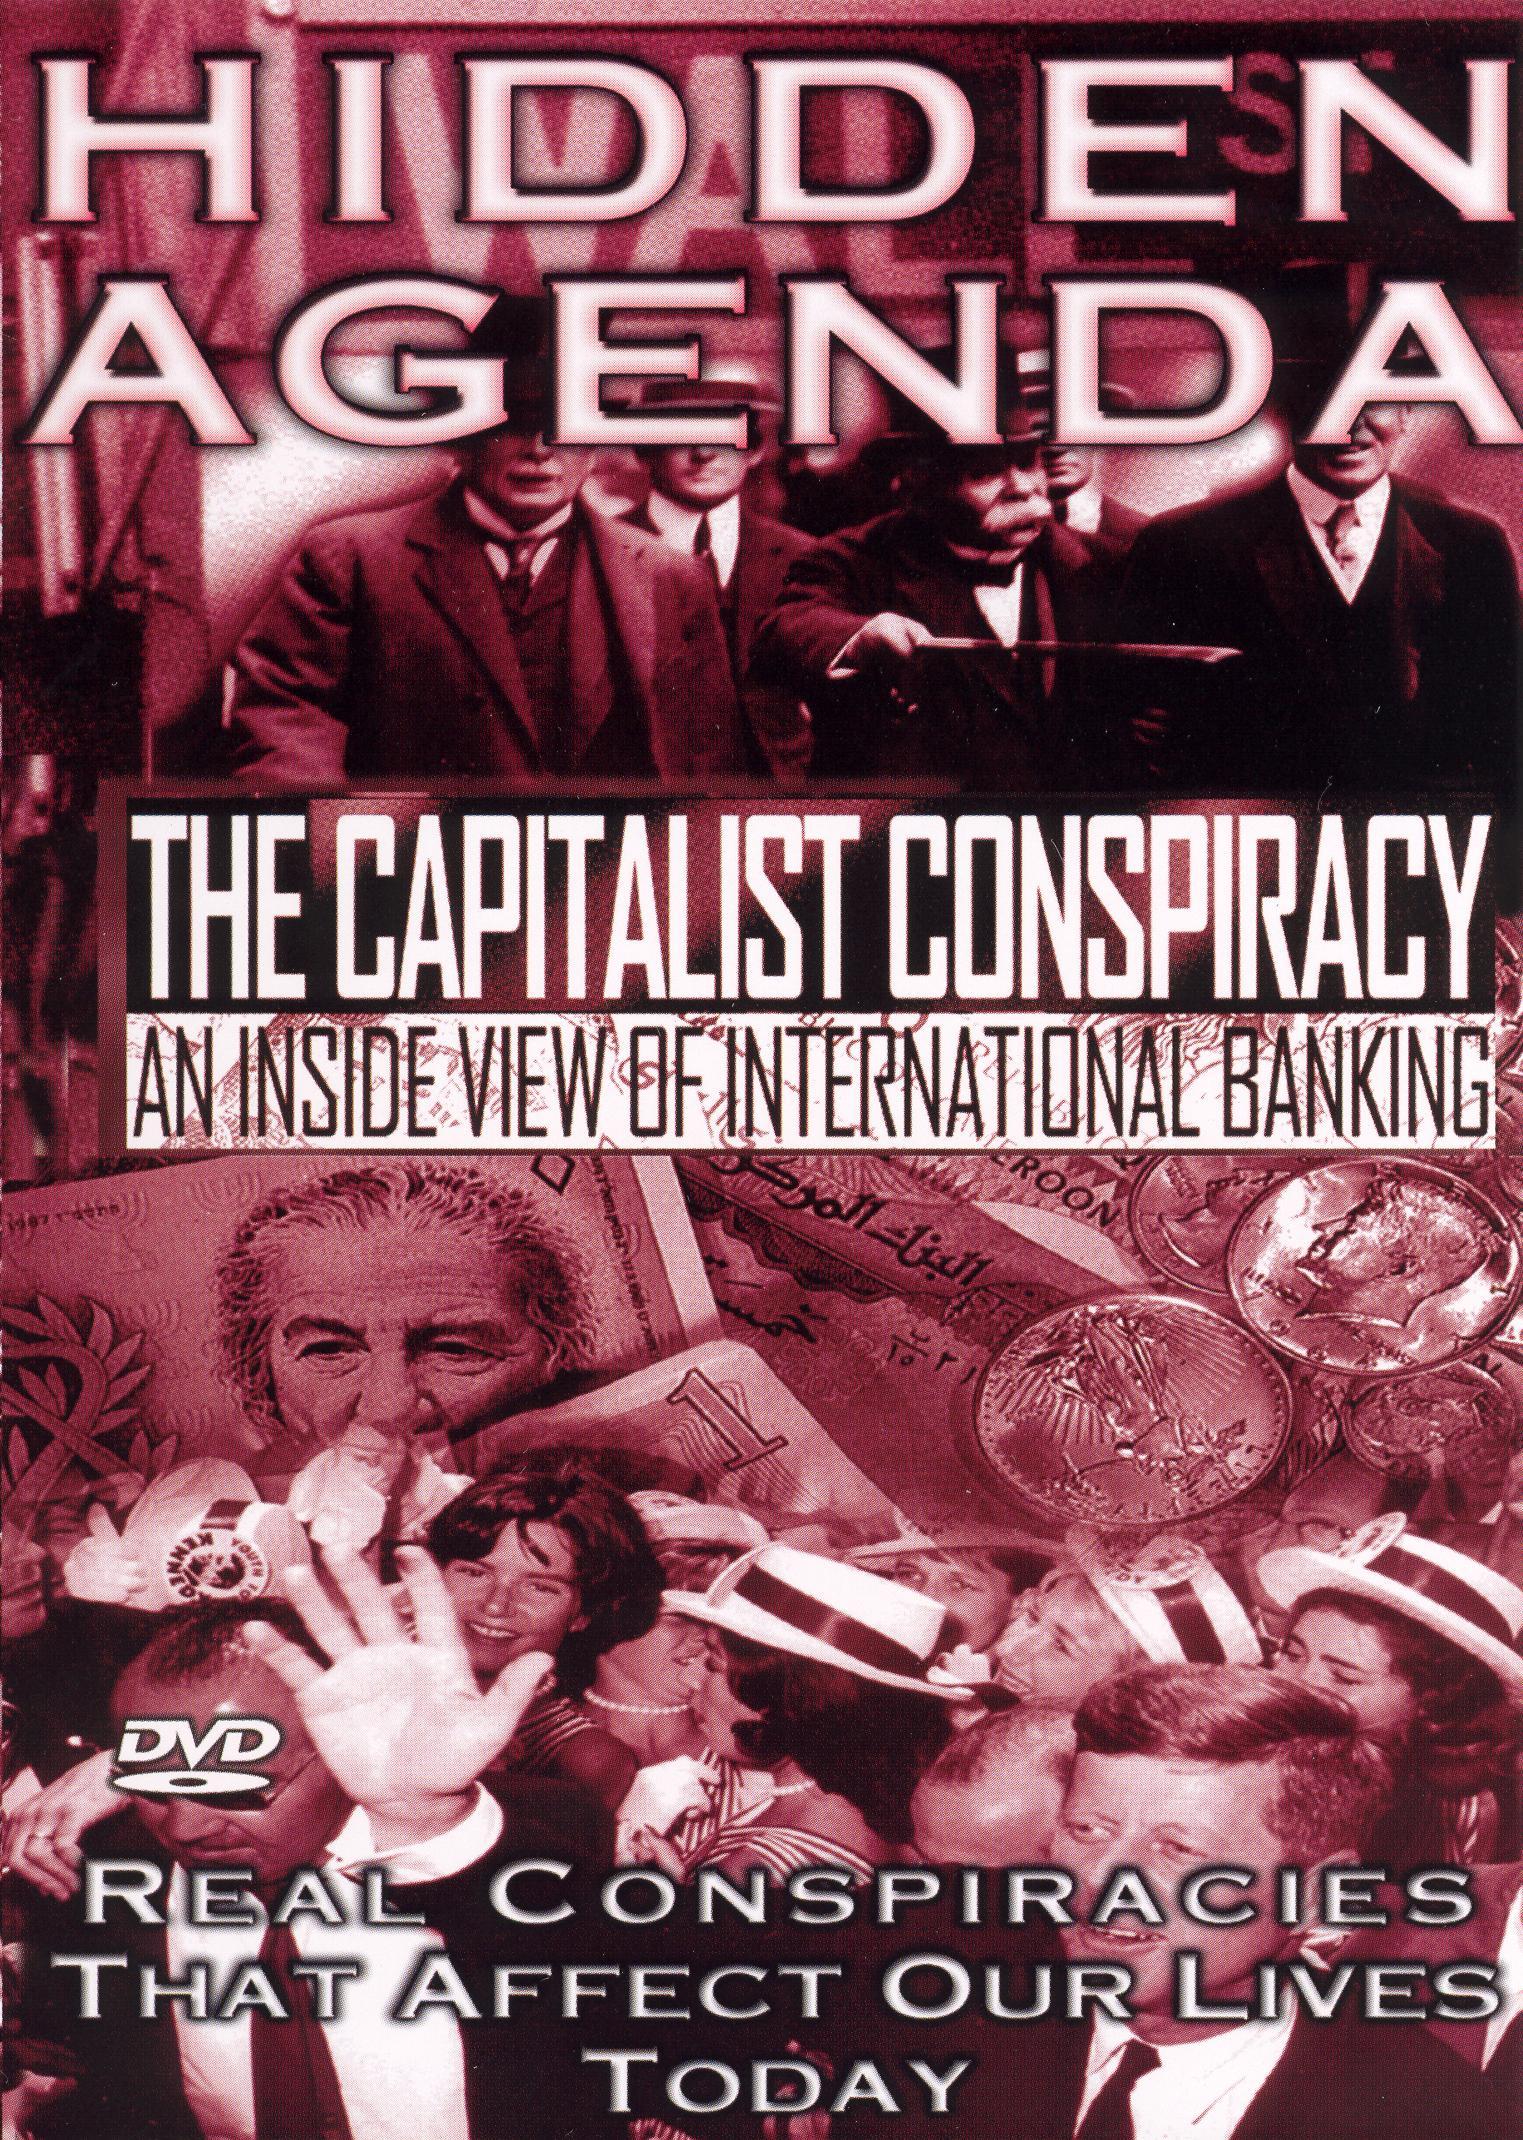 Hidden Agenda, Vol. 1: The Capitalist Conspiracy (2004)